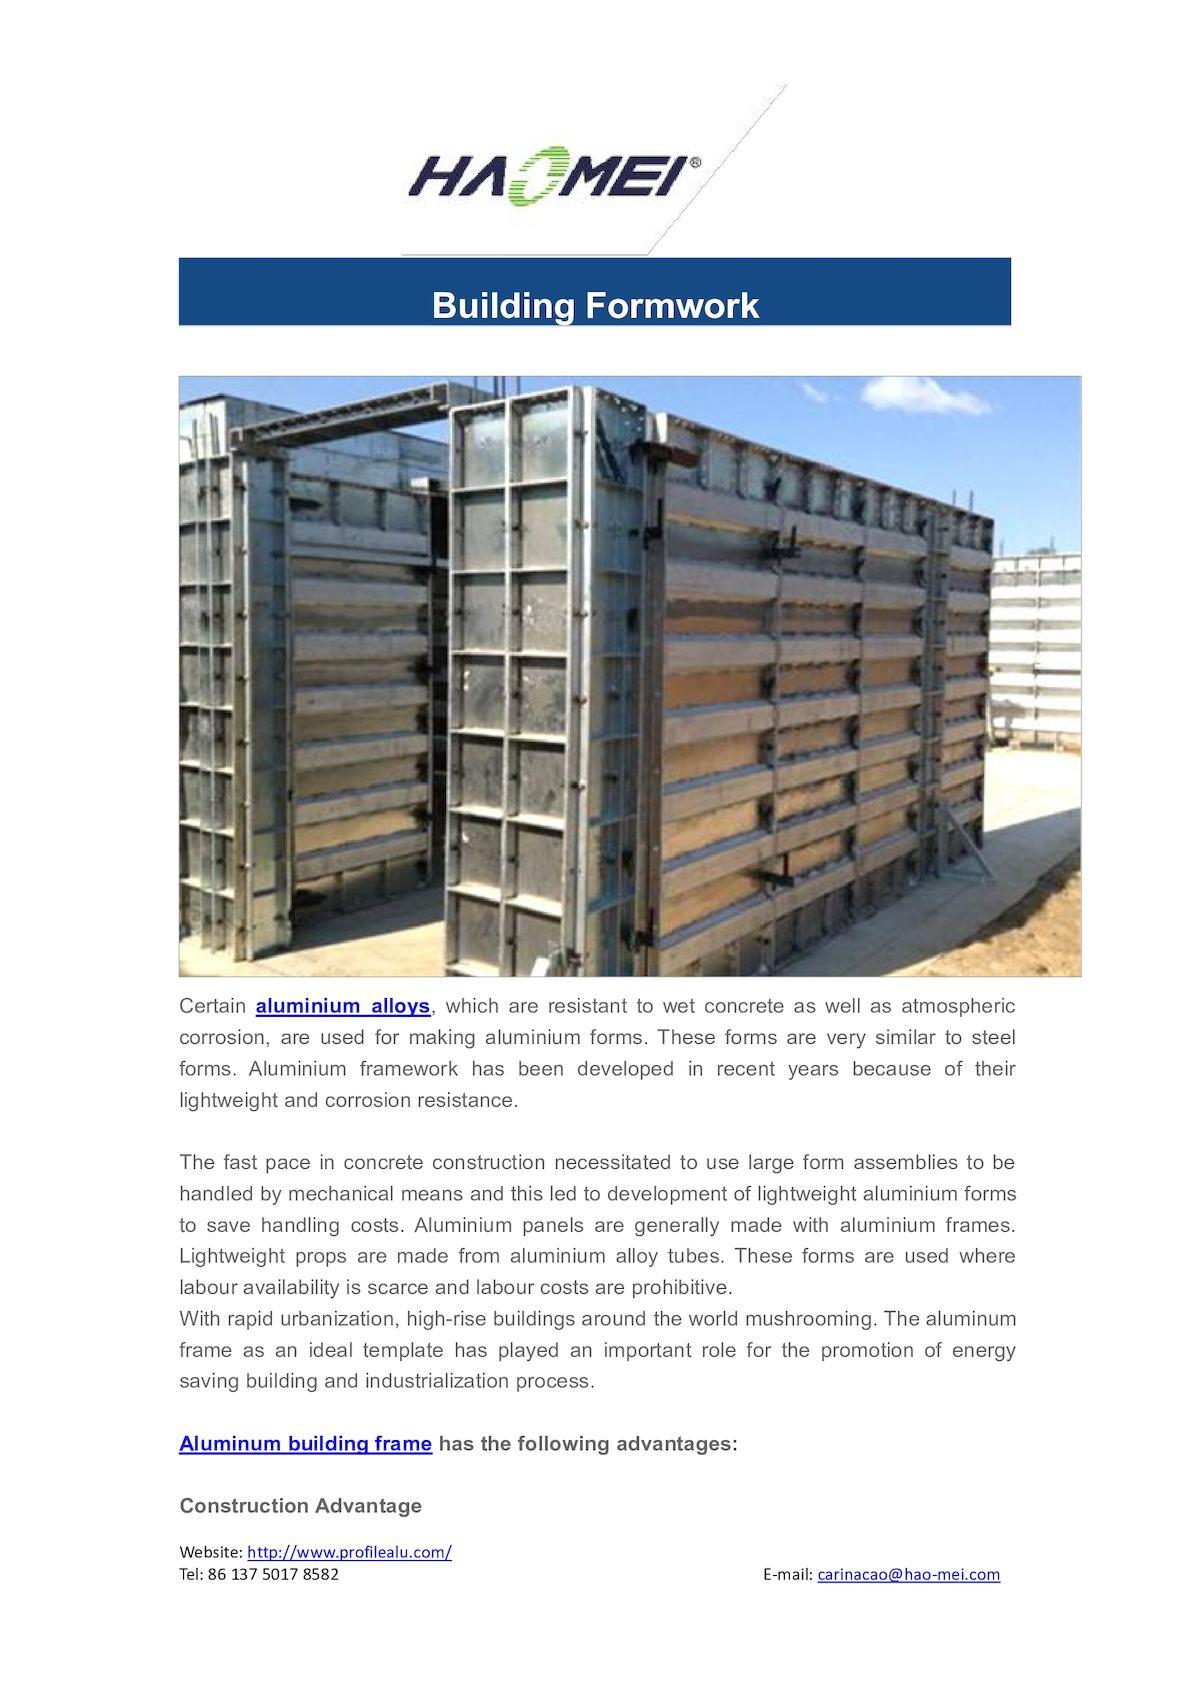 Calaméo - Building Formwork